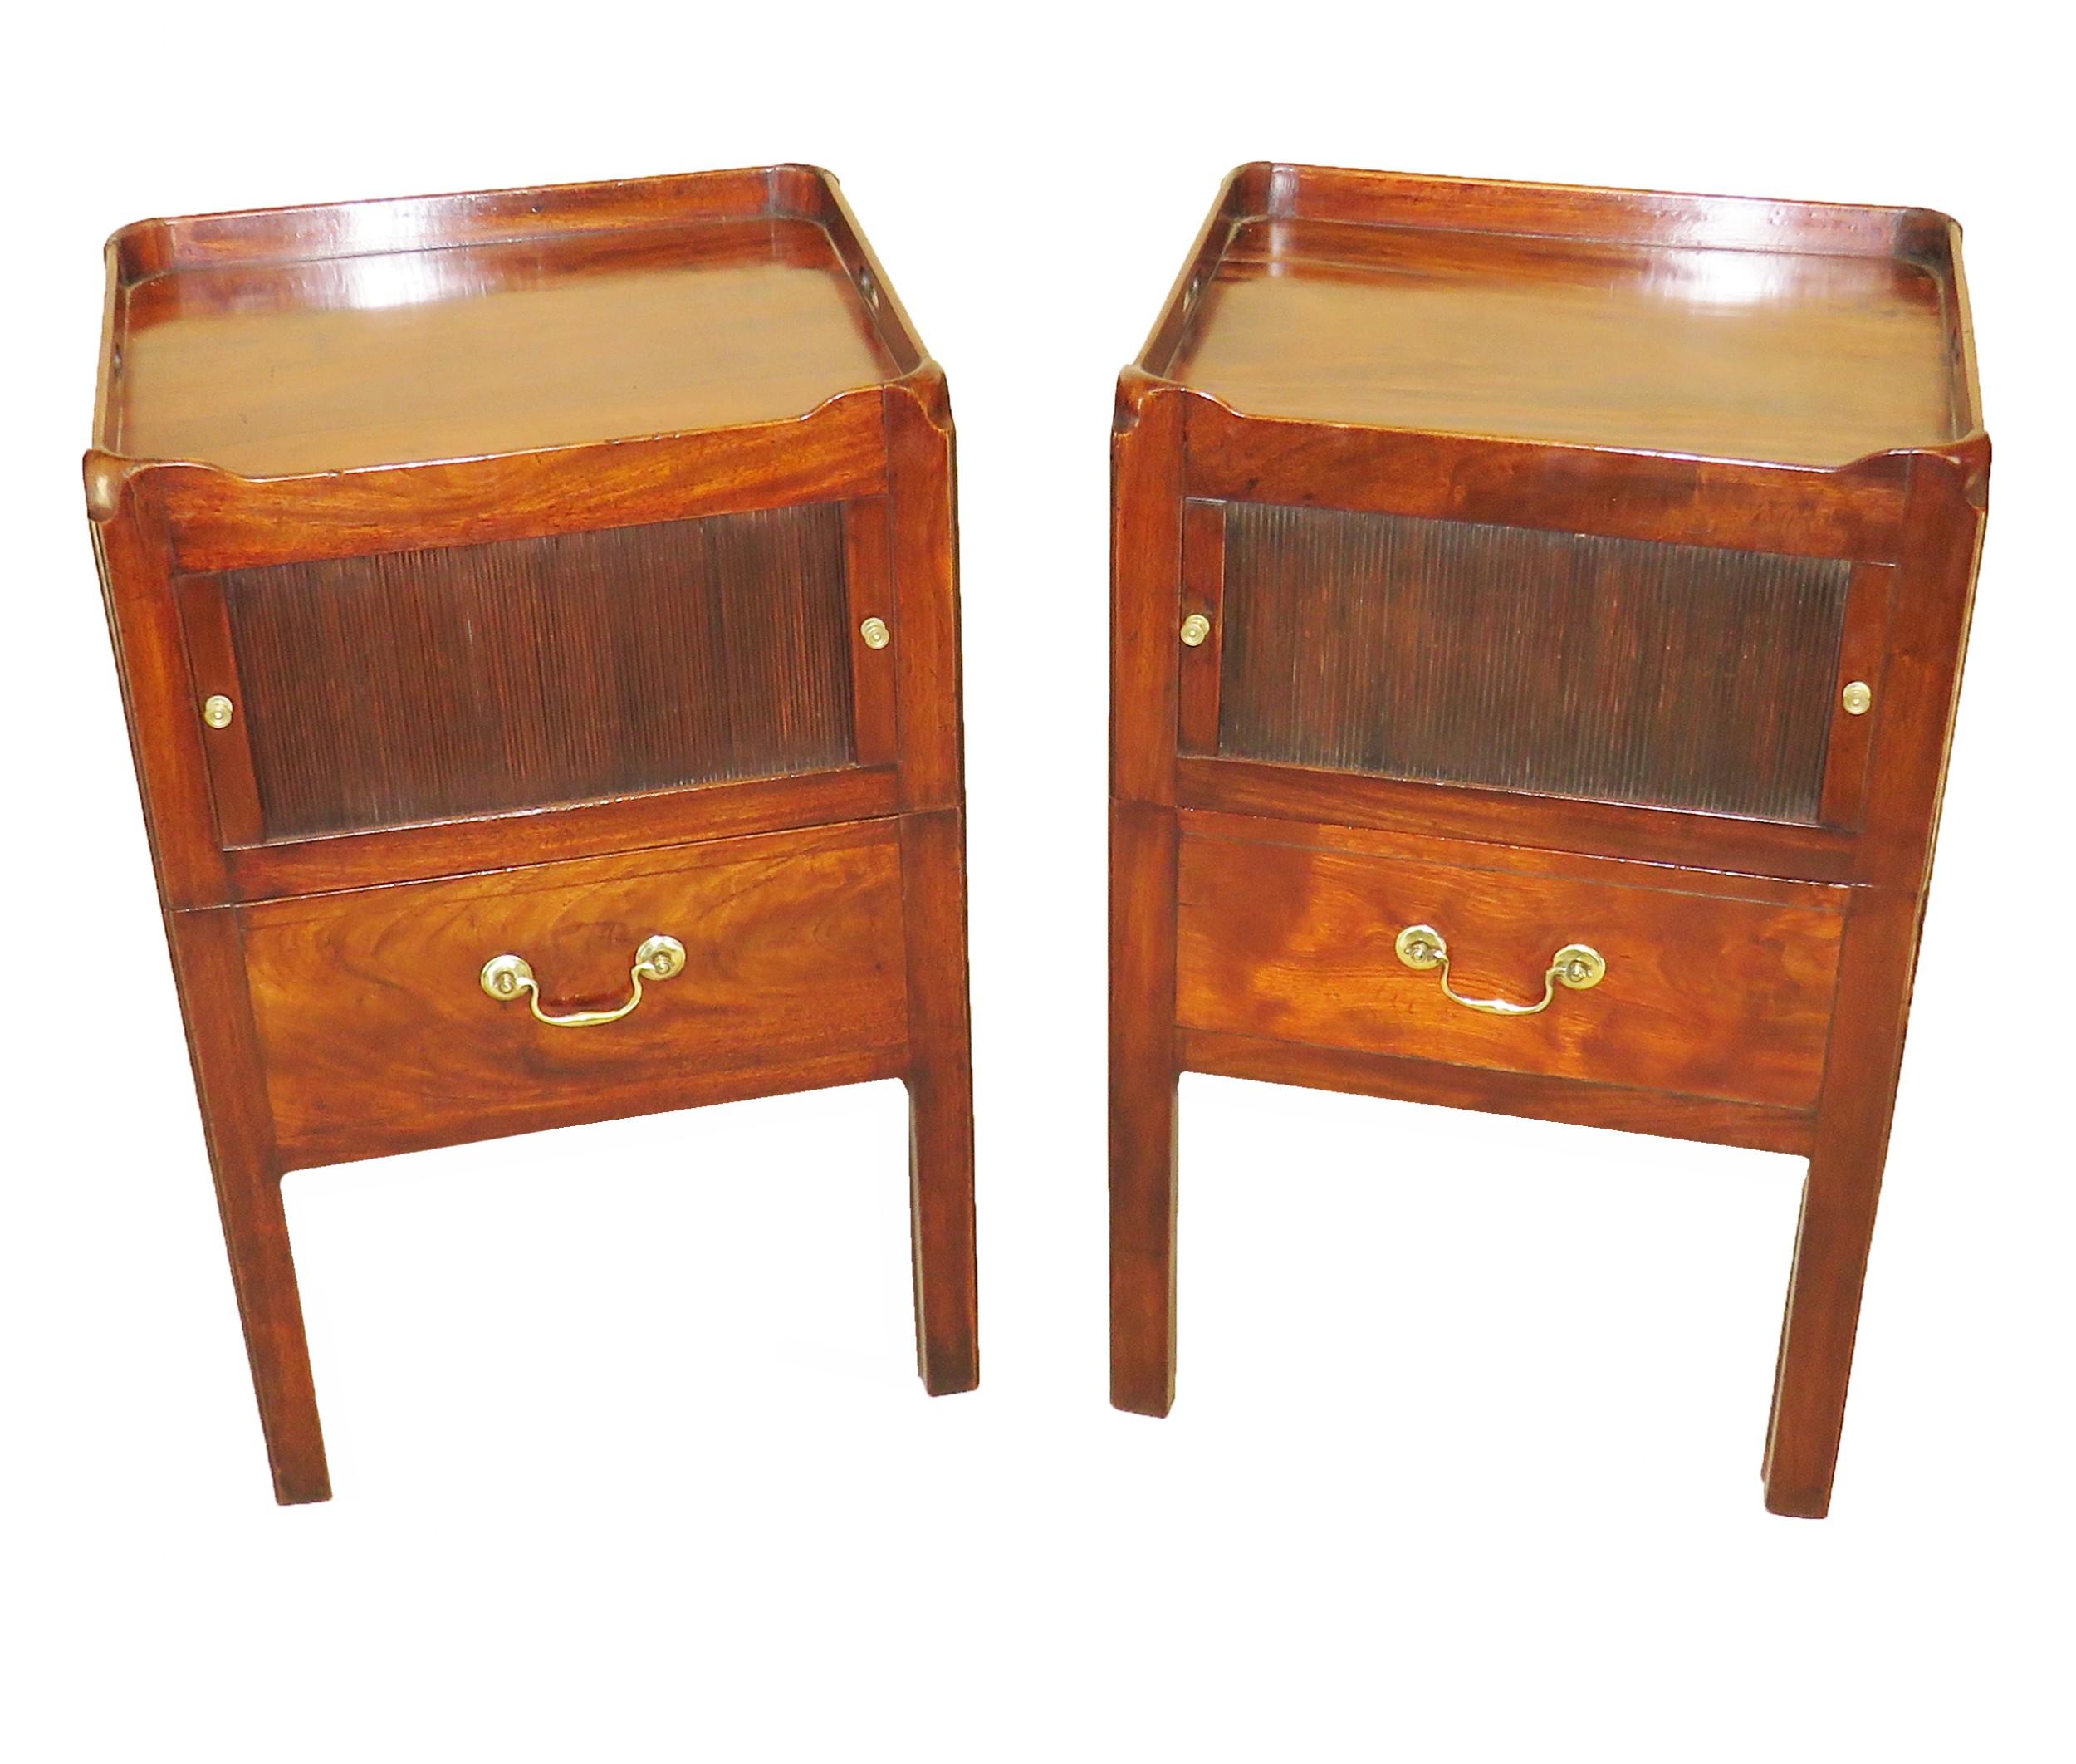 georgian mahogany 18th century pair of bedside night tables